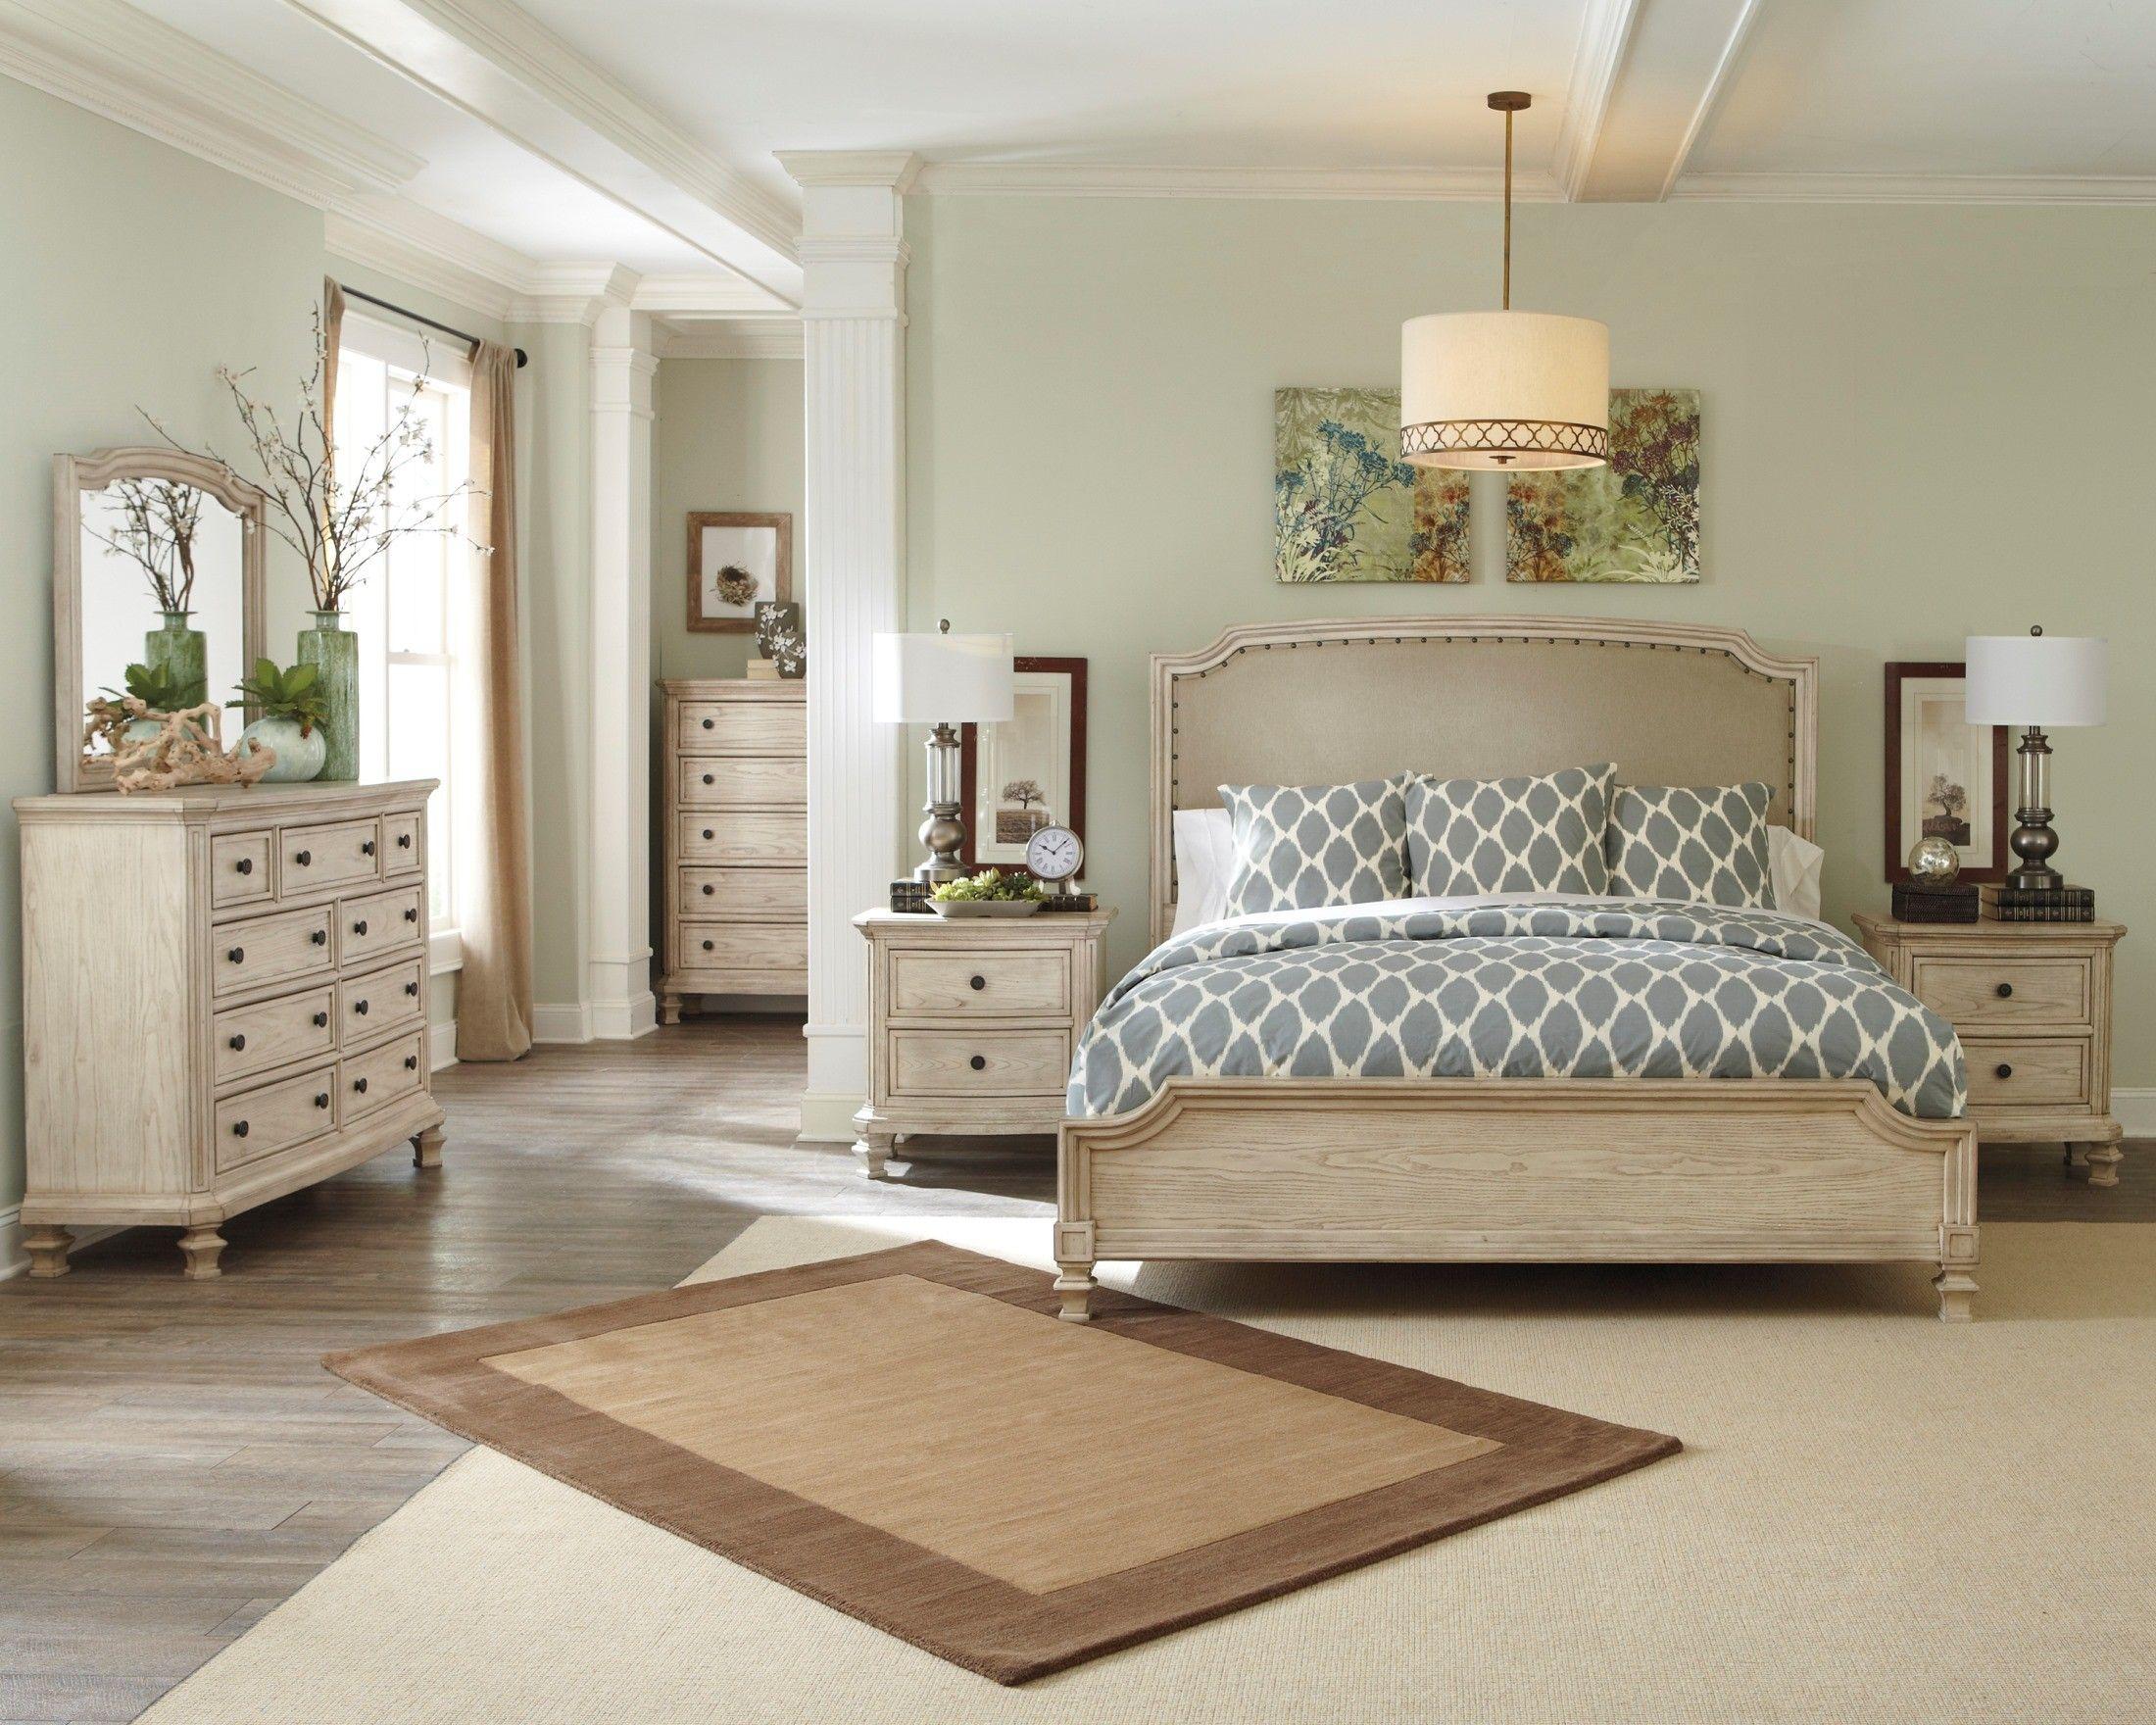 Demarlos Asl B693 78 76 97 Ashley Furniture Also Comes